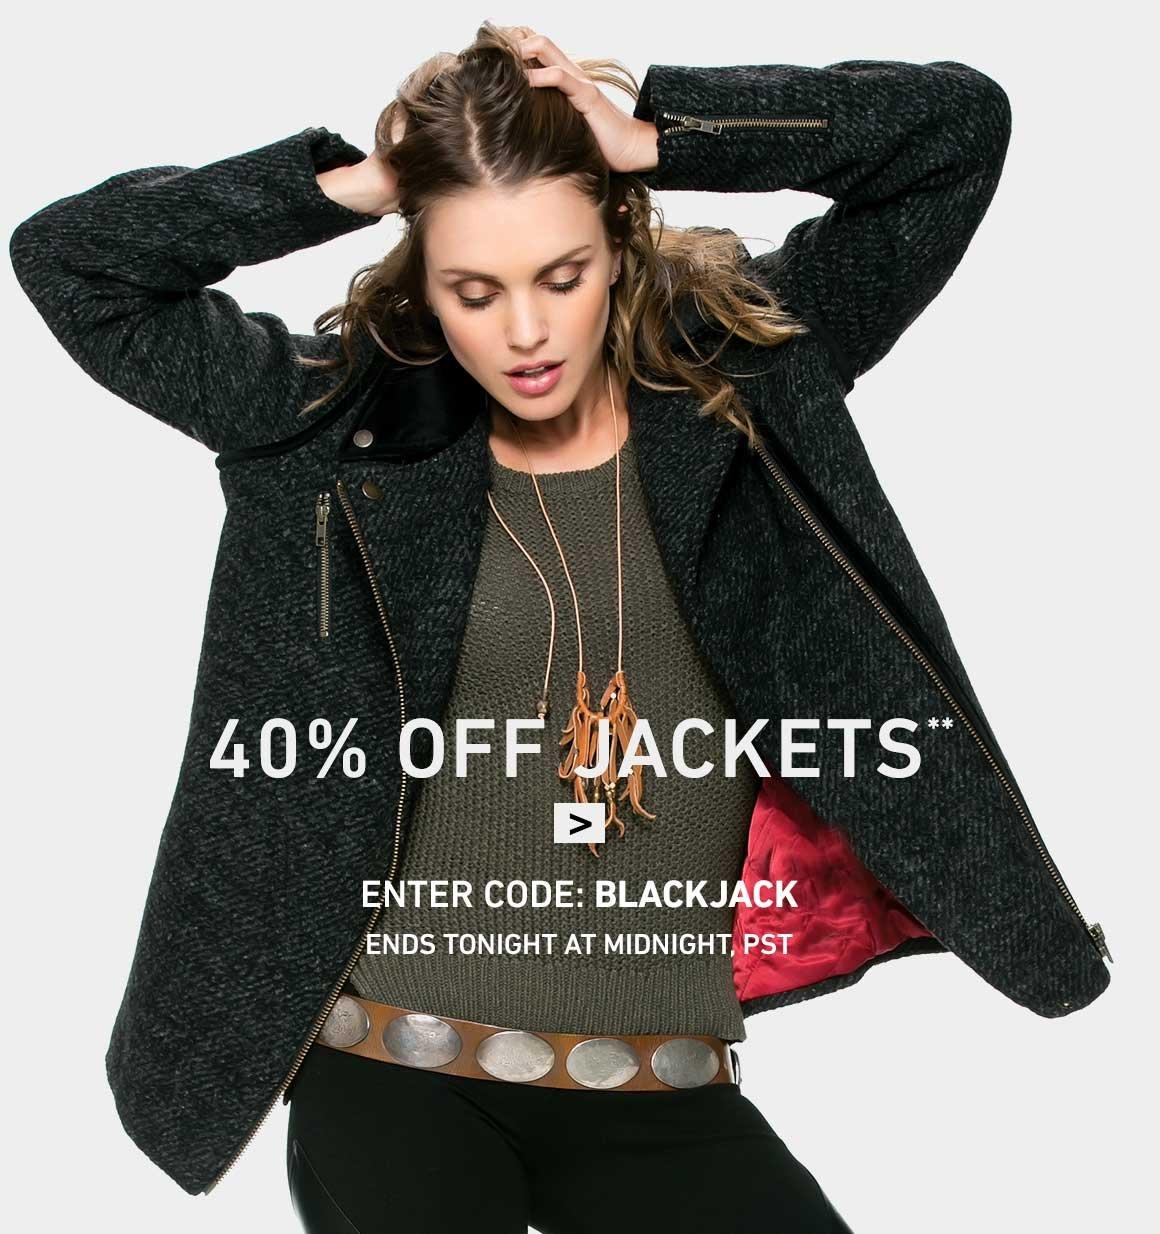 40% OFF NEW WOMEN'S JACKETS! ENTER CODE: BLACKJACK